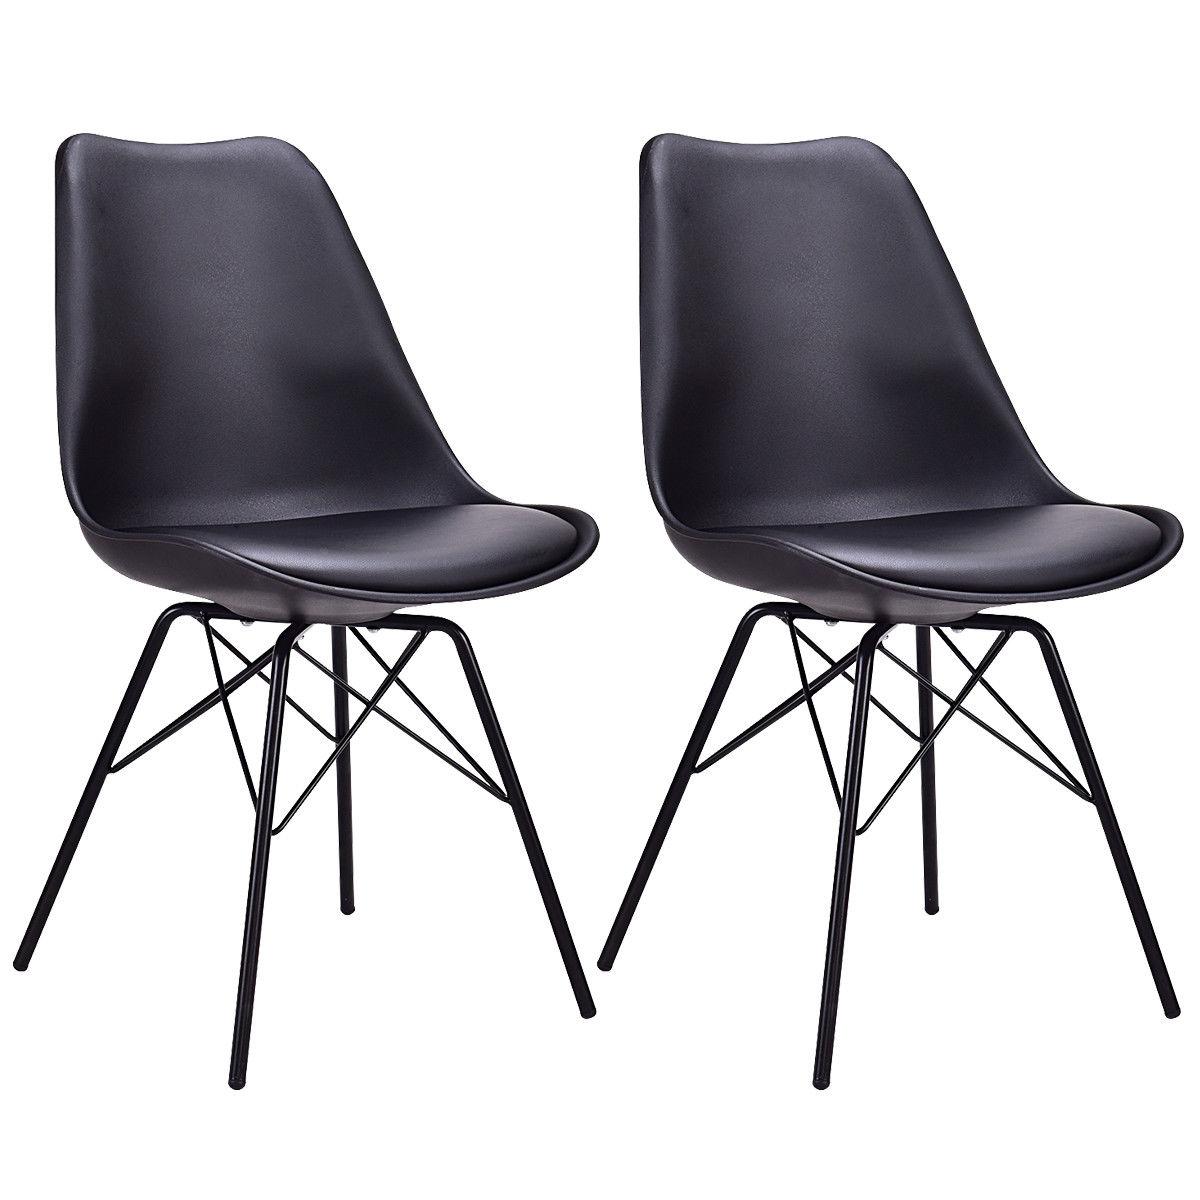 купить Giantex Set of 2pcs Dining Side Chair Upholstered Armless with Padded Seat Metal Legs Black Modern Home Furniture HW56508BK по цене 4886.43 рублей